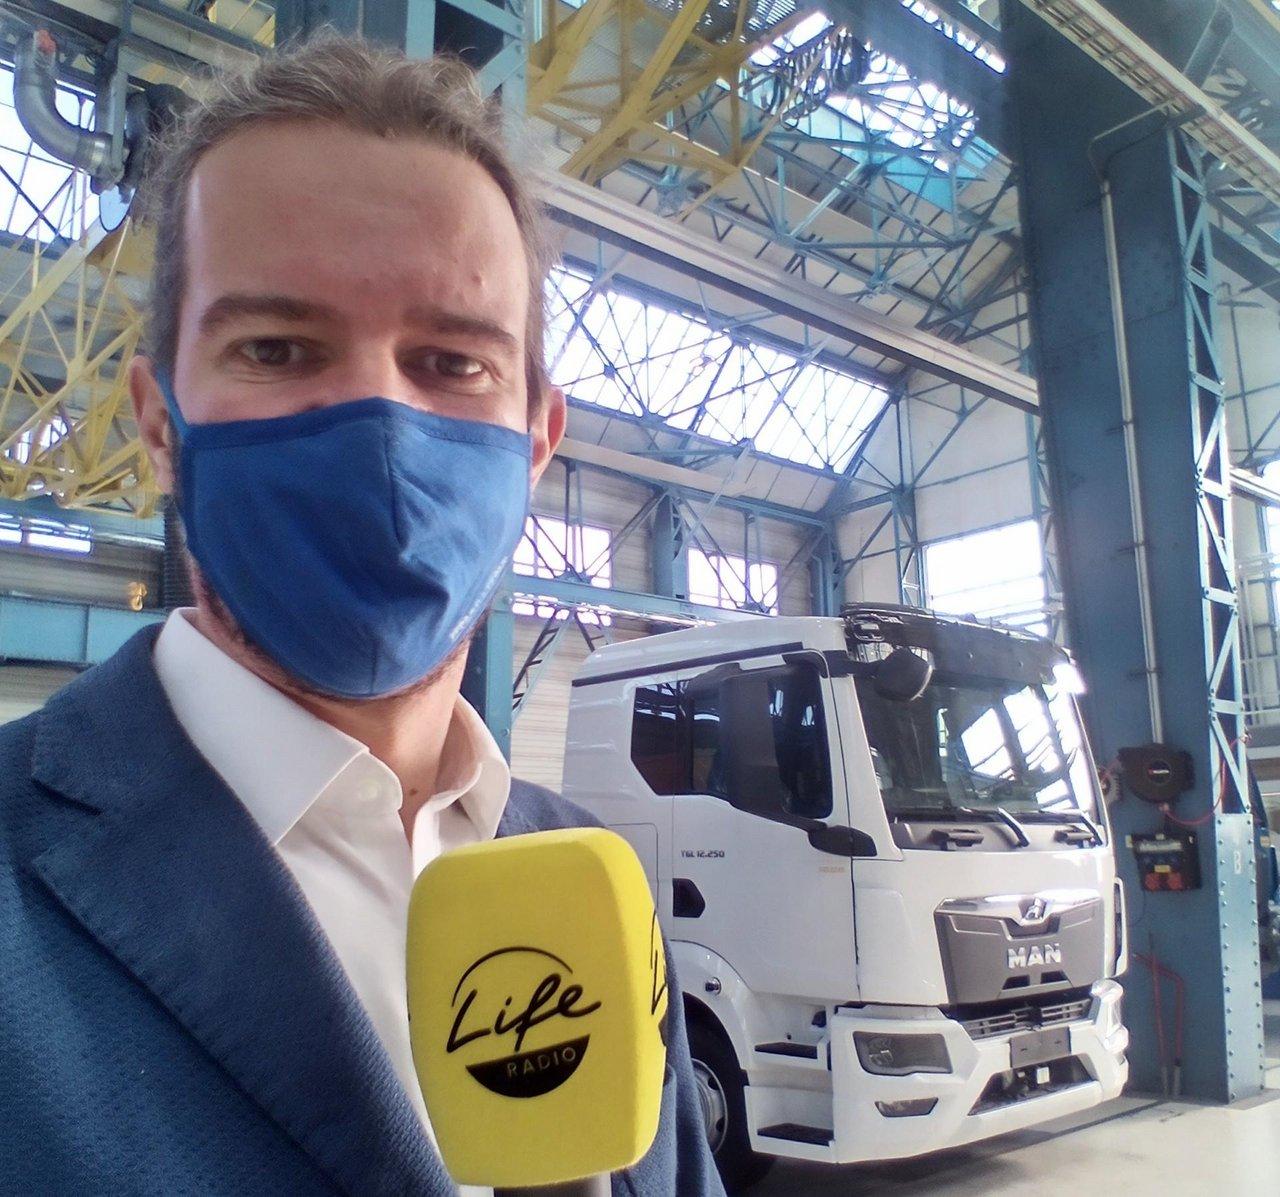 Life Radio Reporter Daniel Kortschak